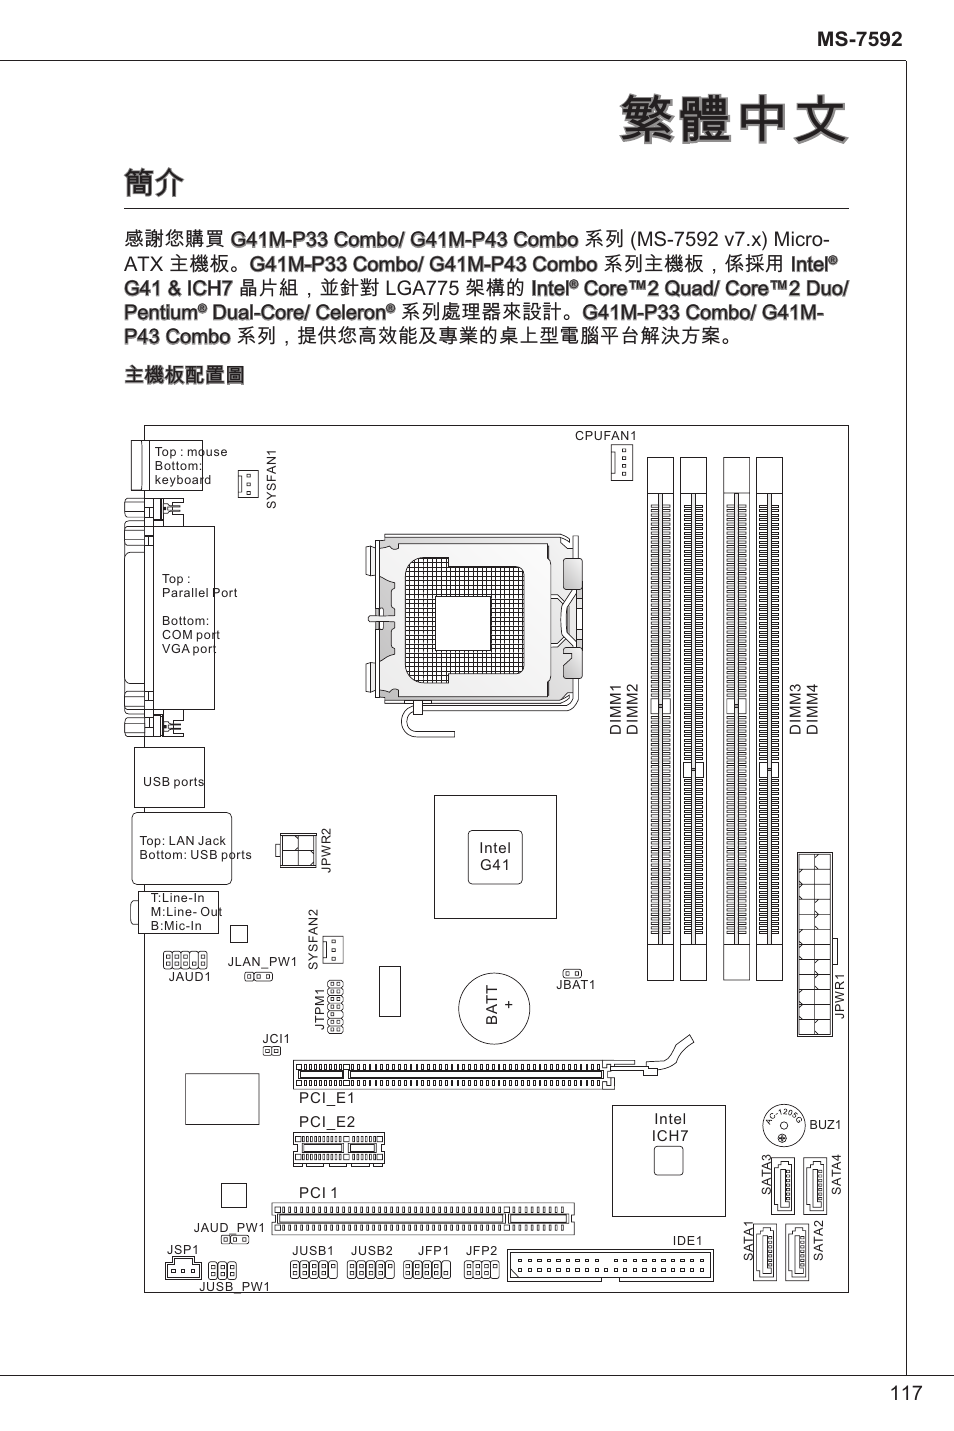 繁體中文, Core™2 quad/ core™2 duo/ pentium, Dual